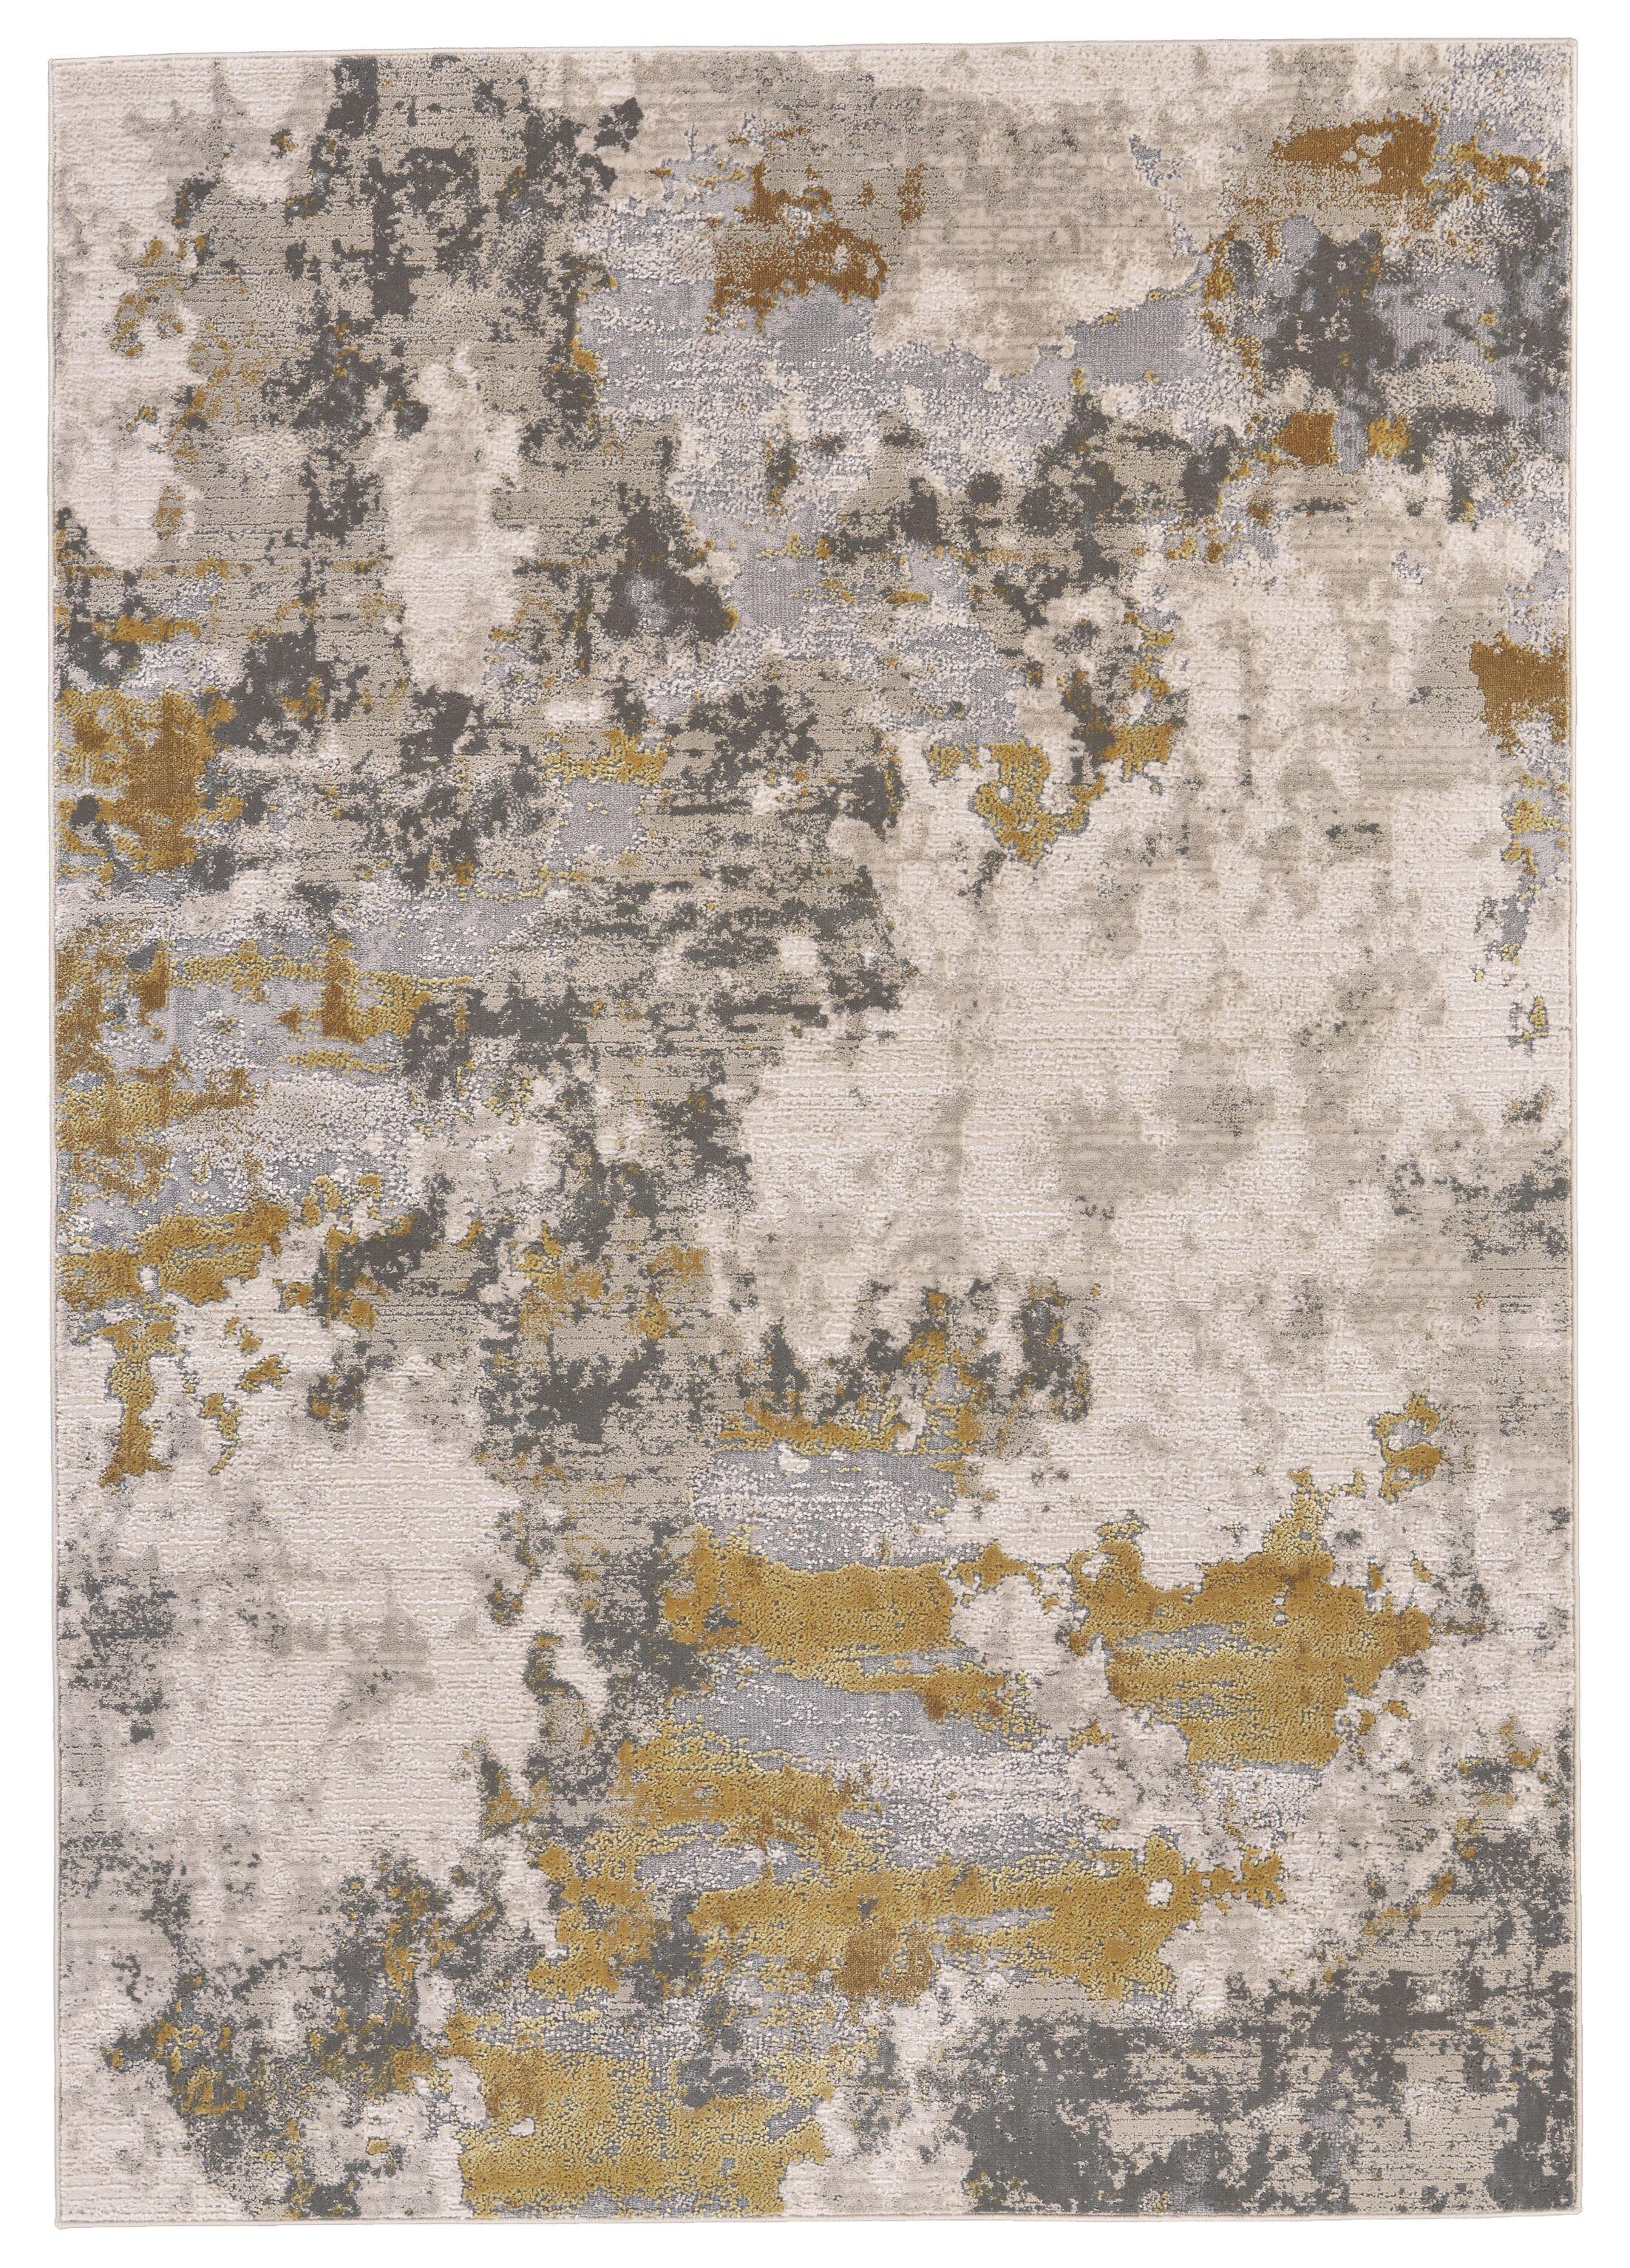 Reichenbach Gold/Birch Area Rug Rug Size: Rectangle 8' x 11'